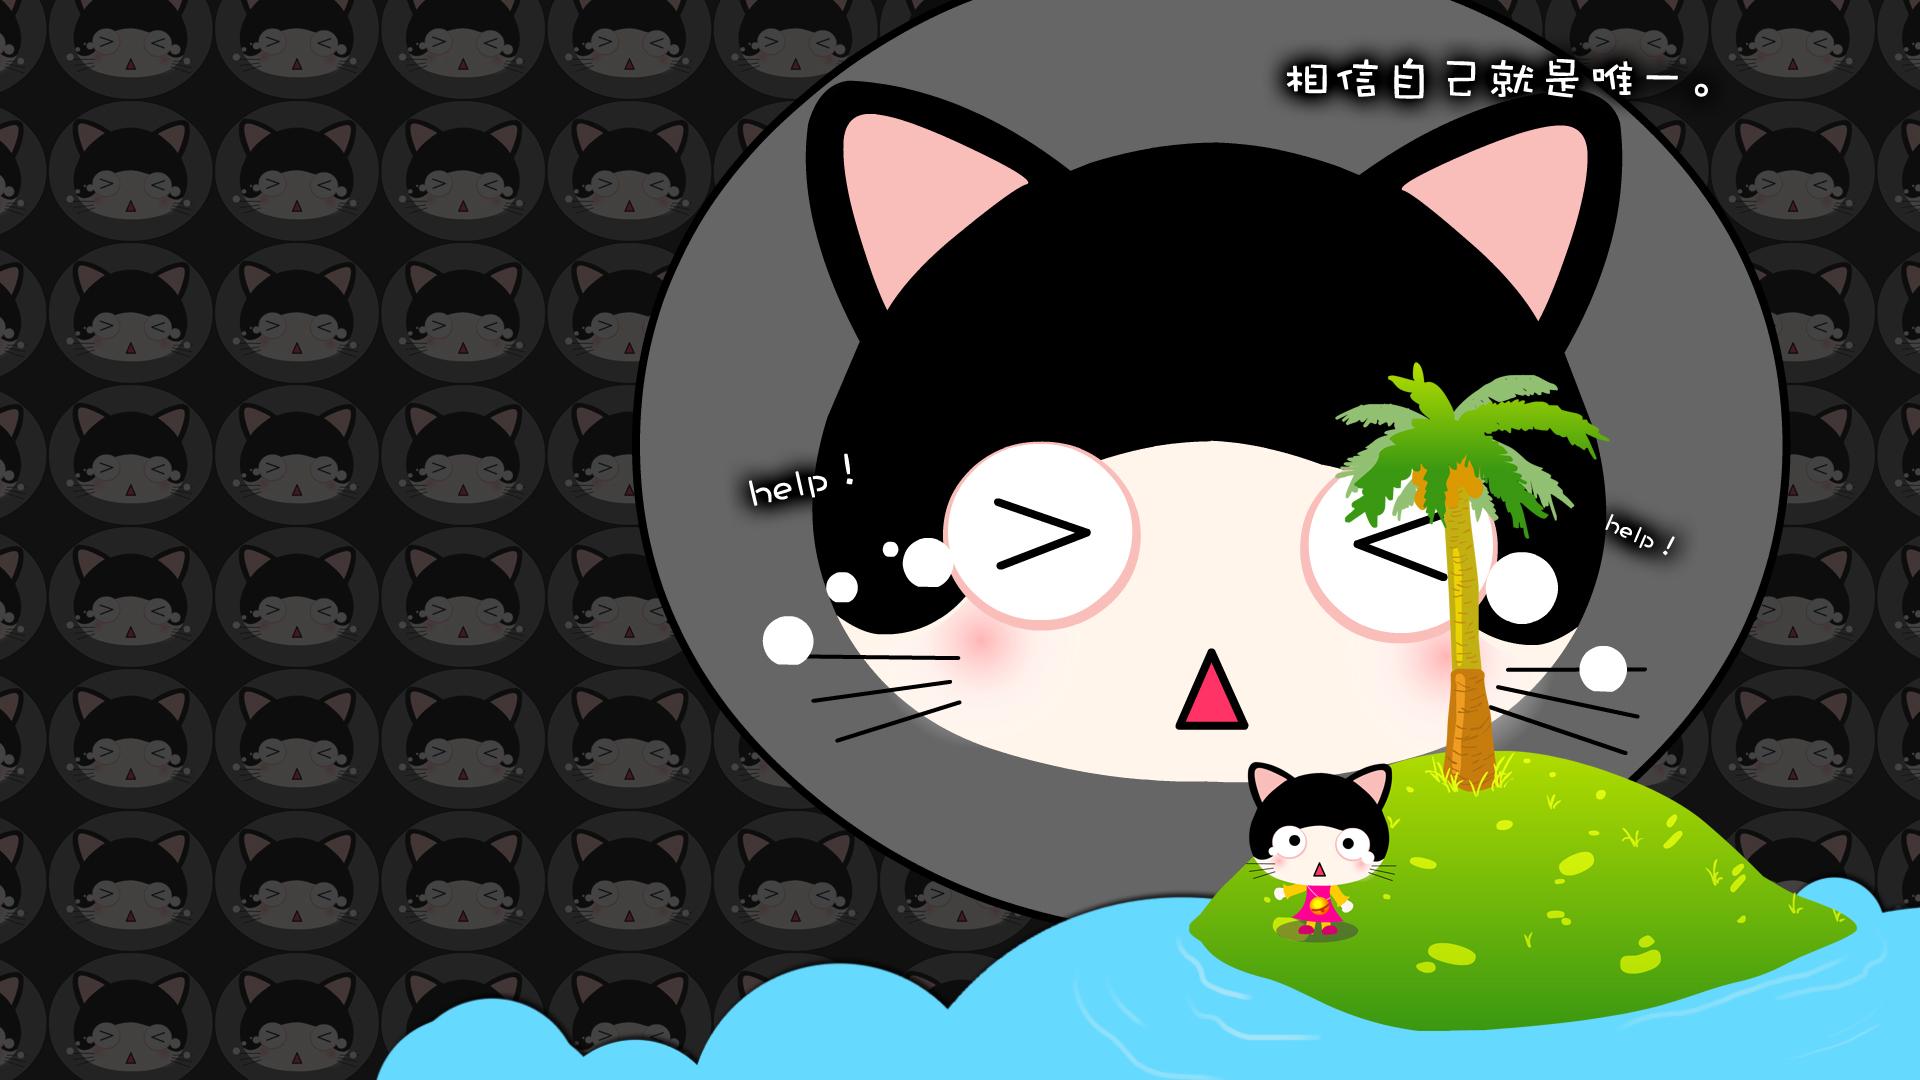 xtone翔通动漫集团-猫咪宝贝精美壁纸(一)